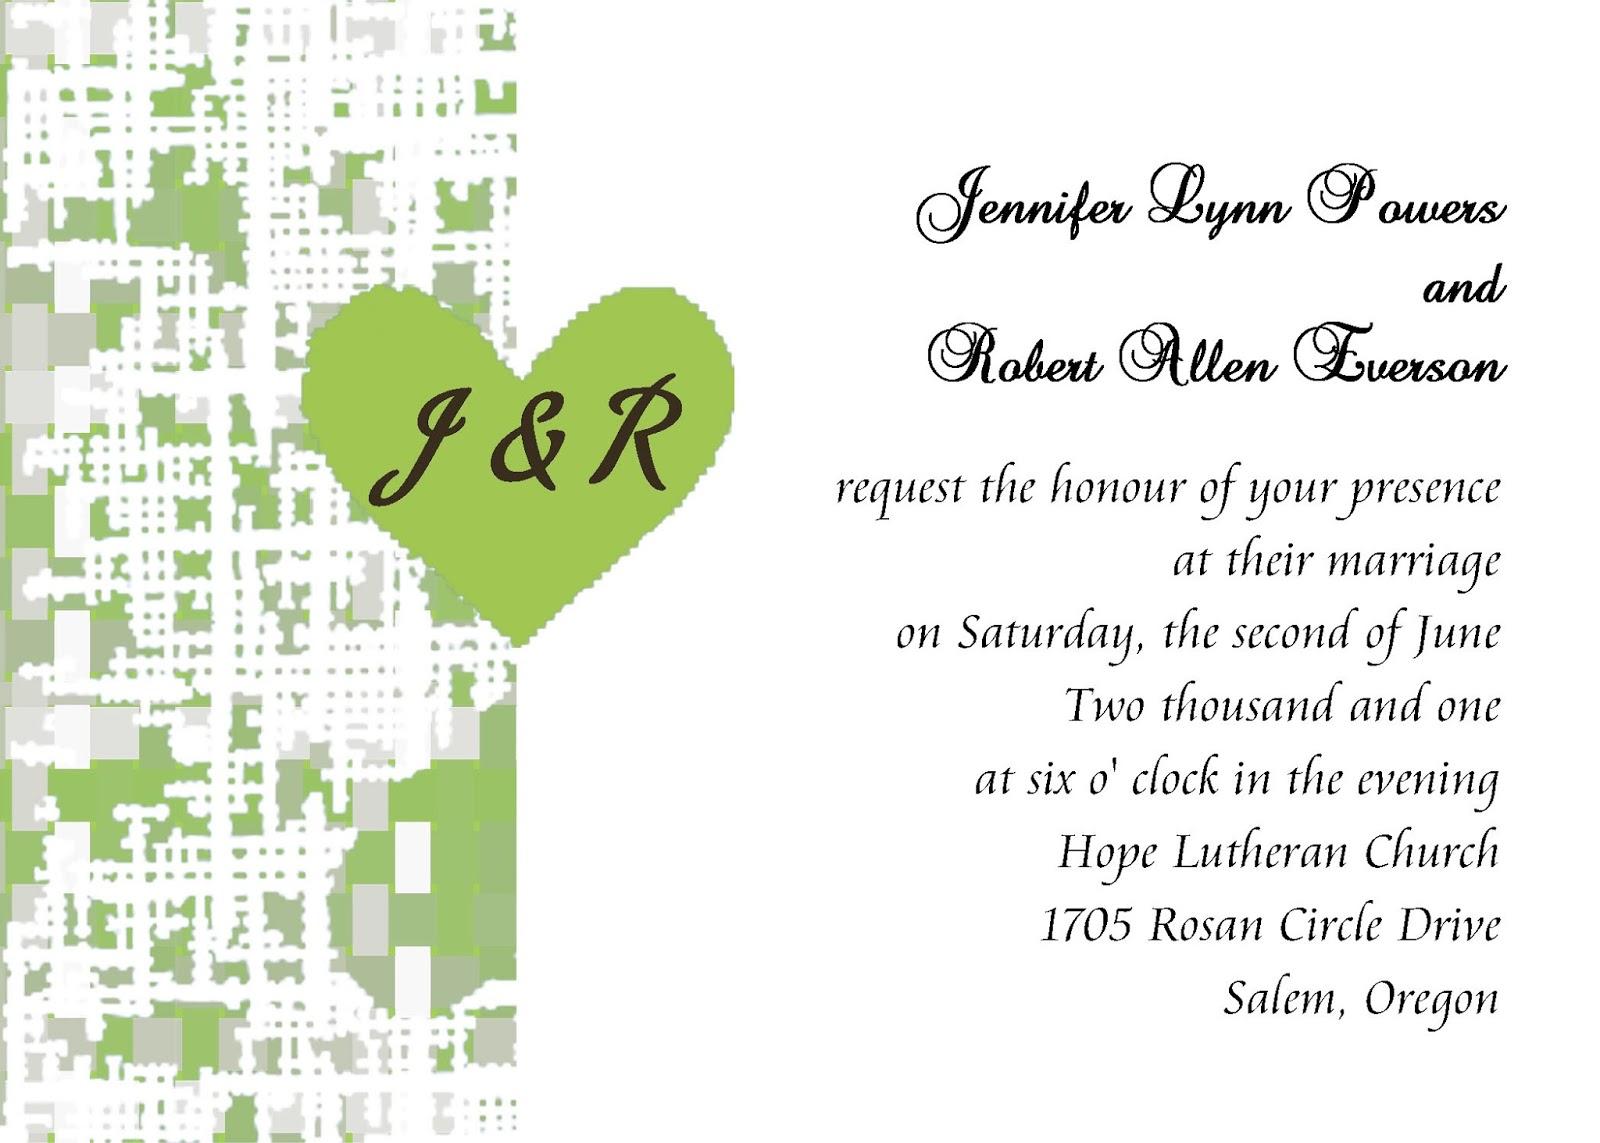 Proper Wedding Gift Message : black wedding invitations: wedding invitation etiquette